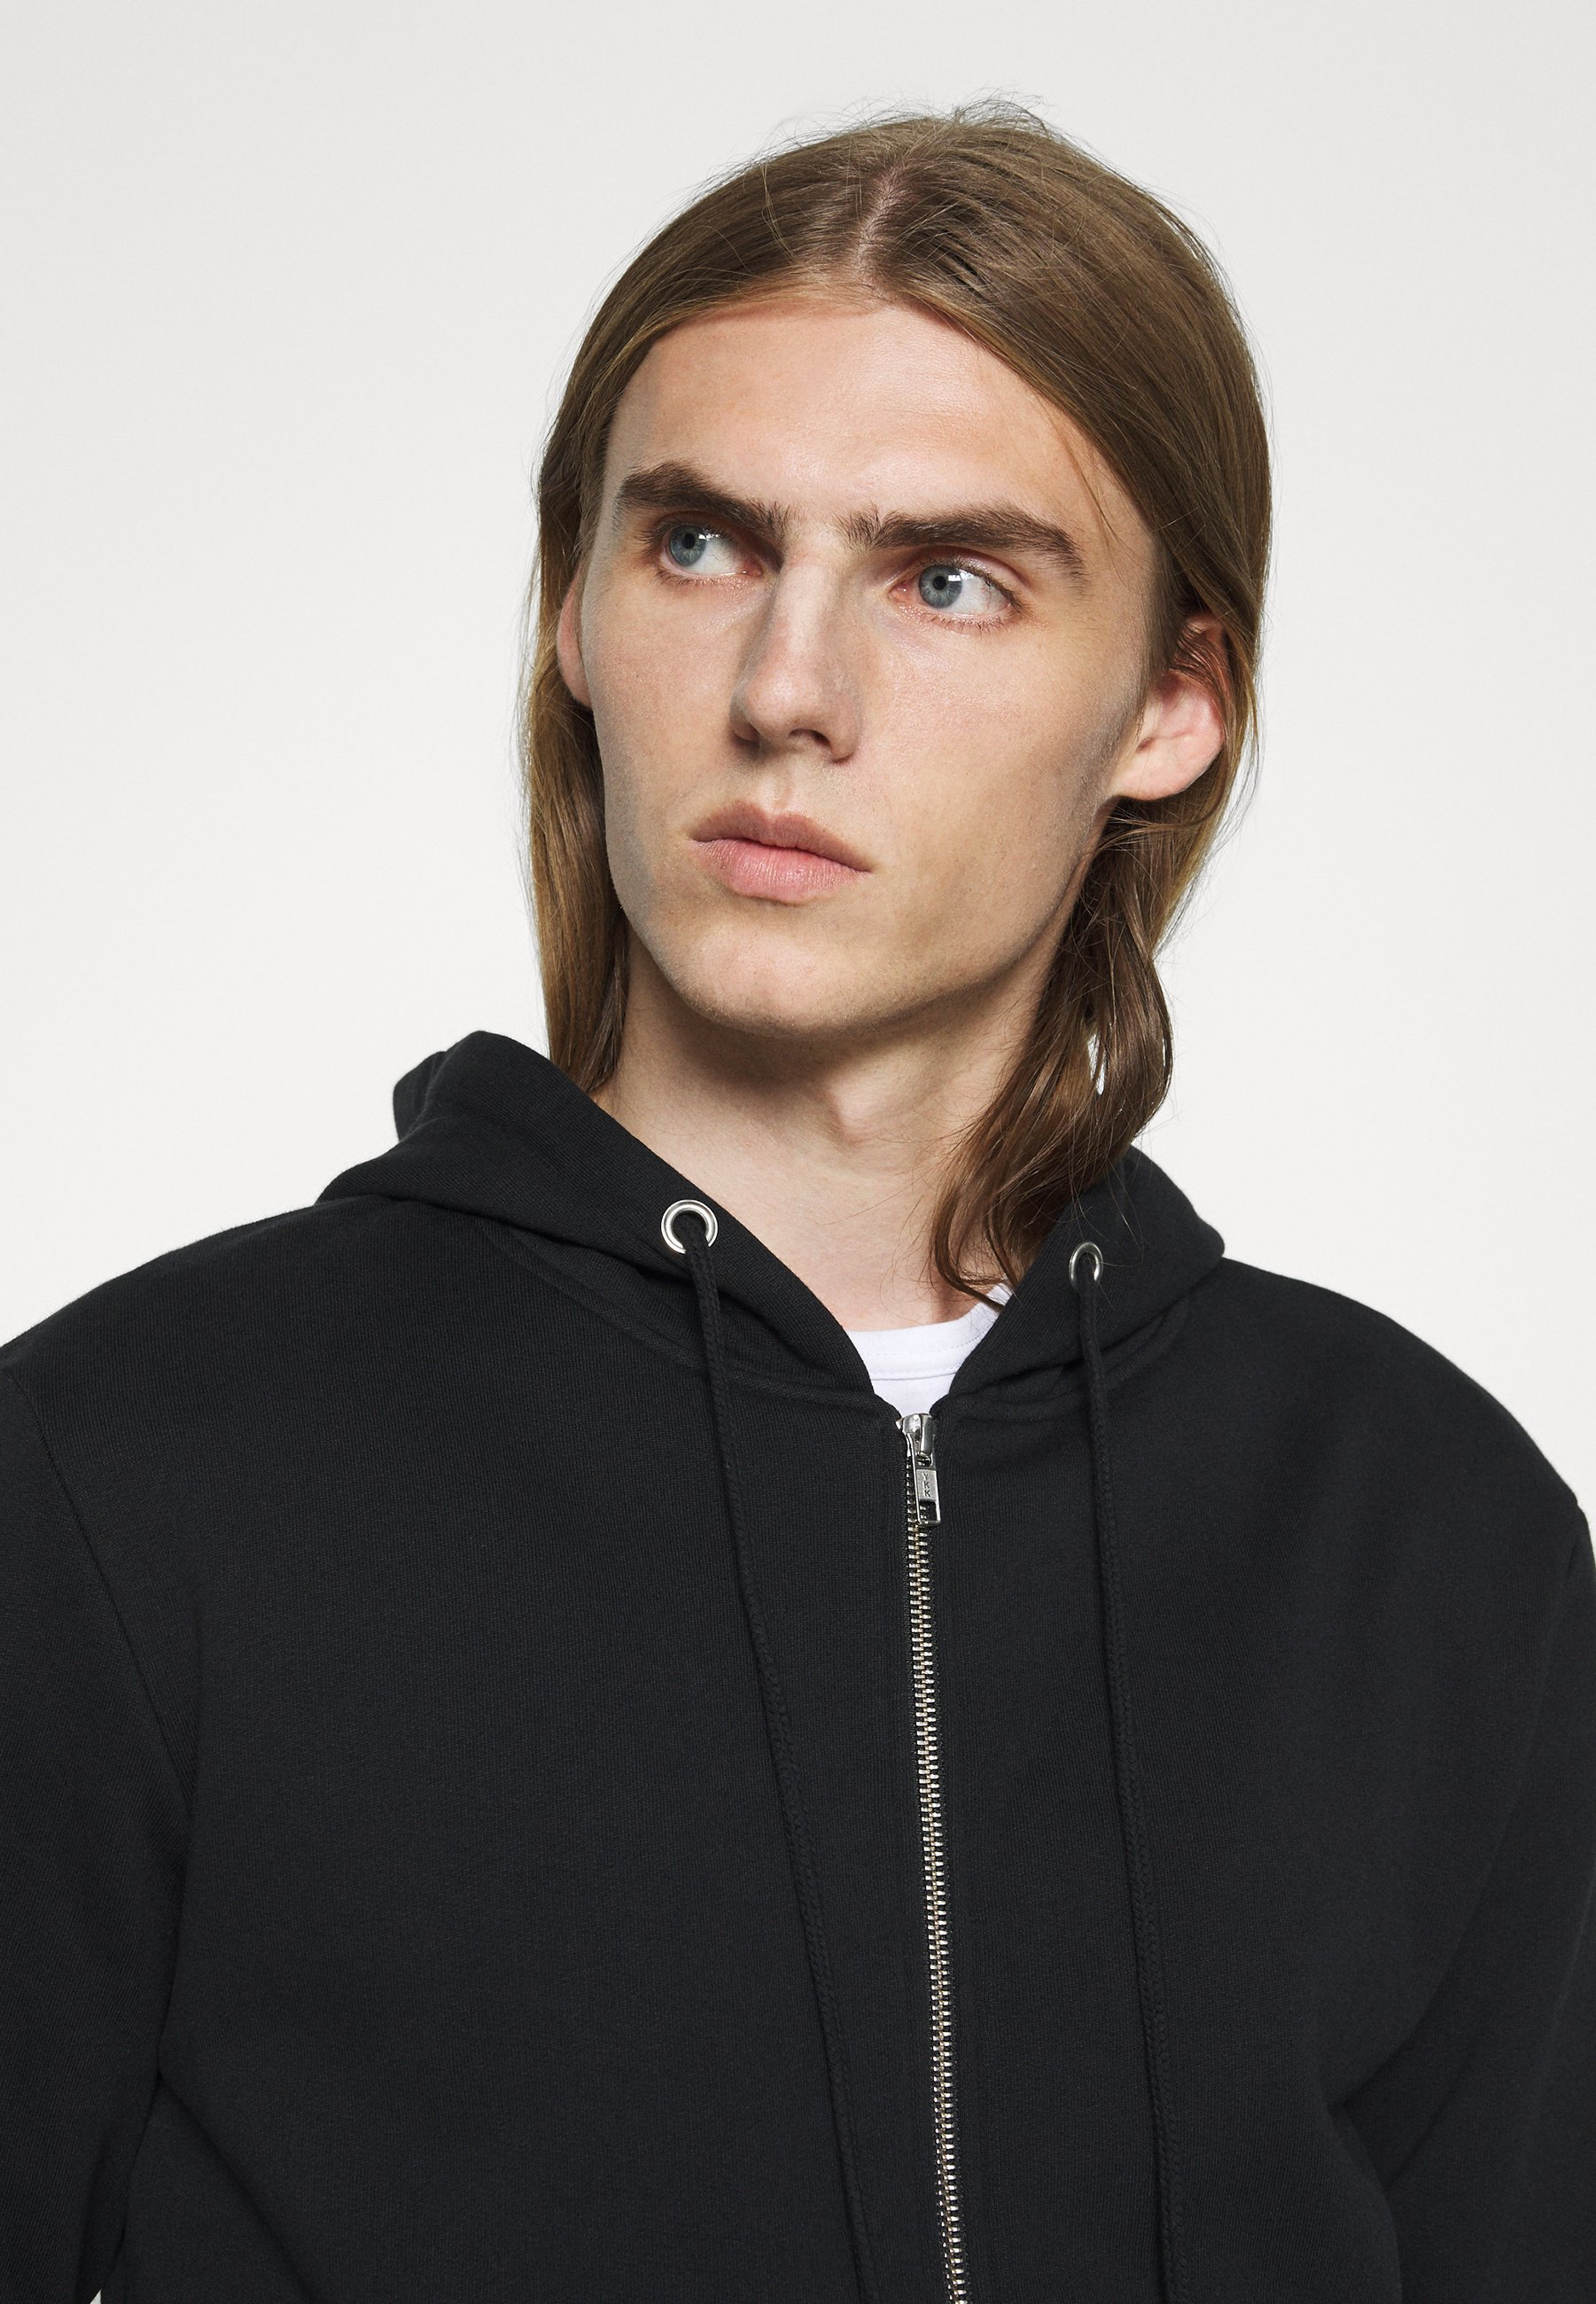 Aaron langermet jakke for menn